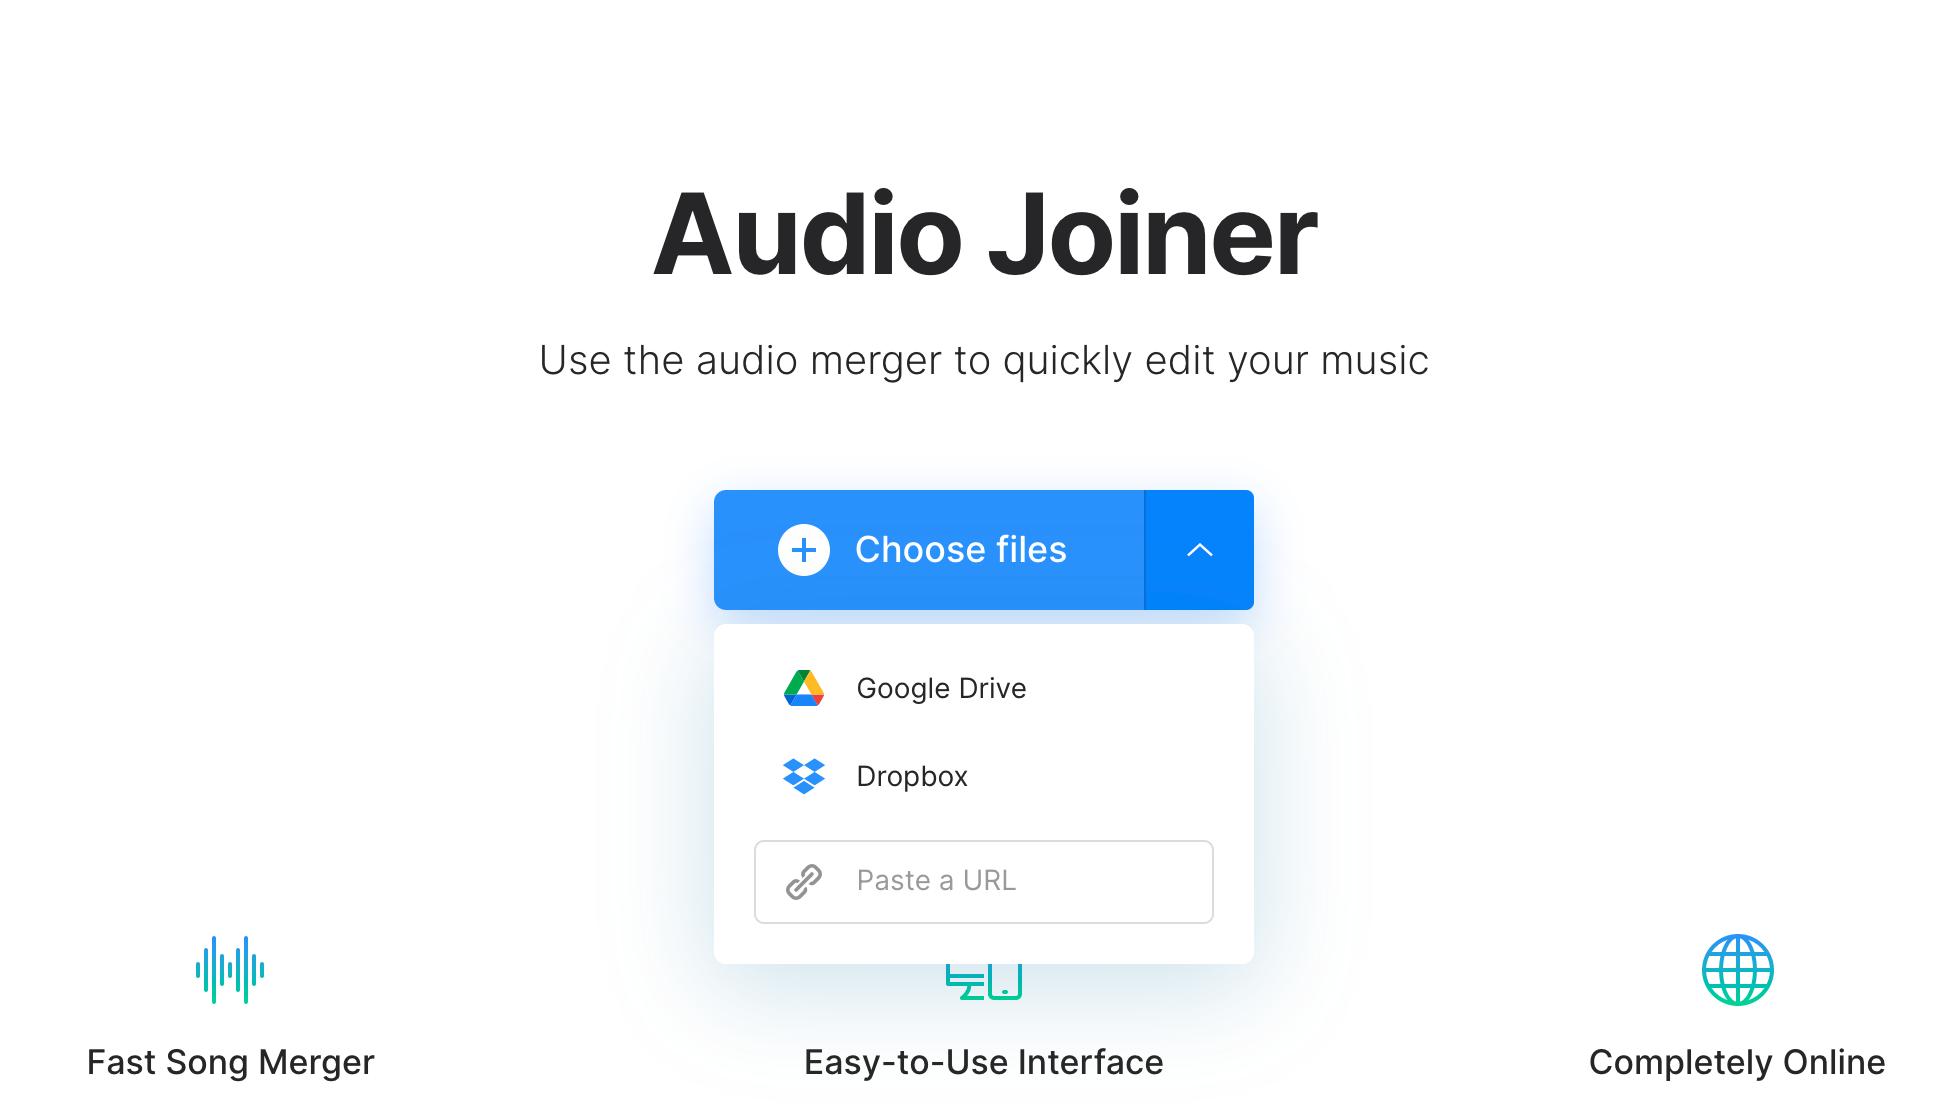 Upload voice memos to combine